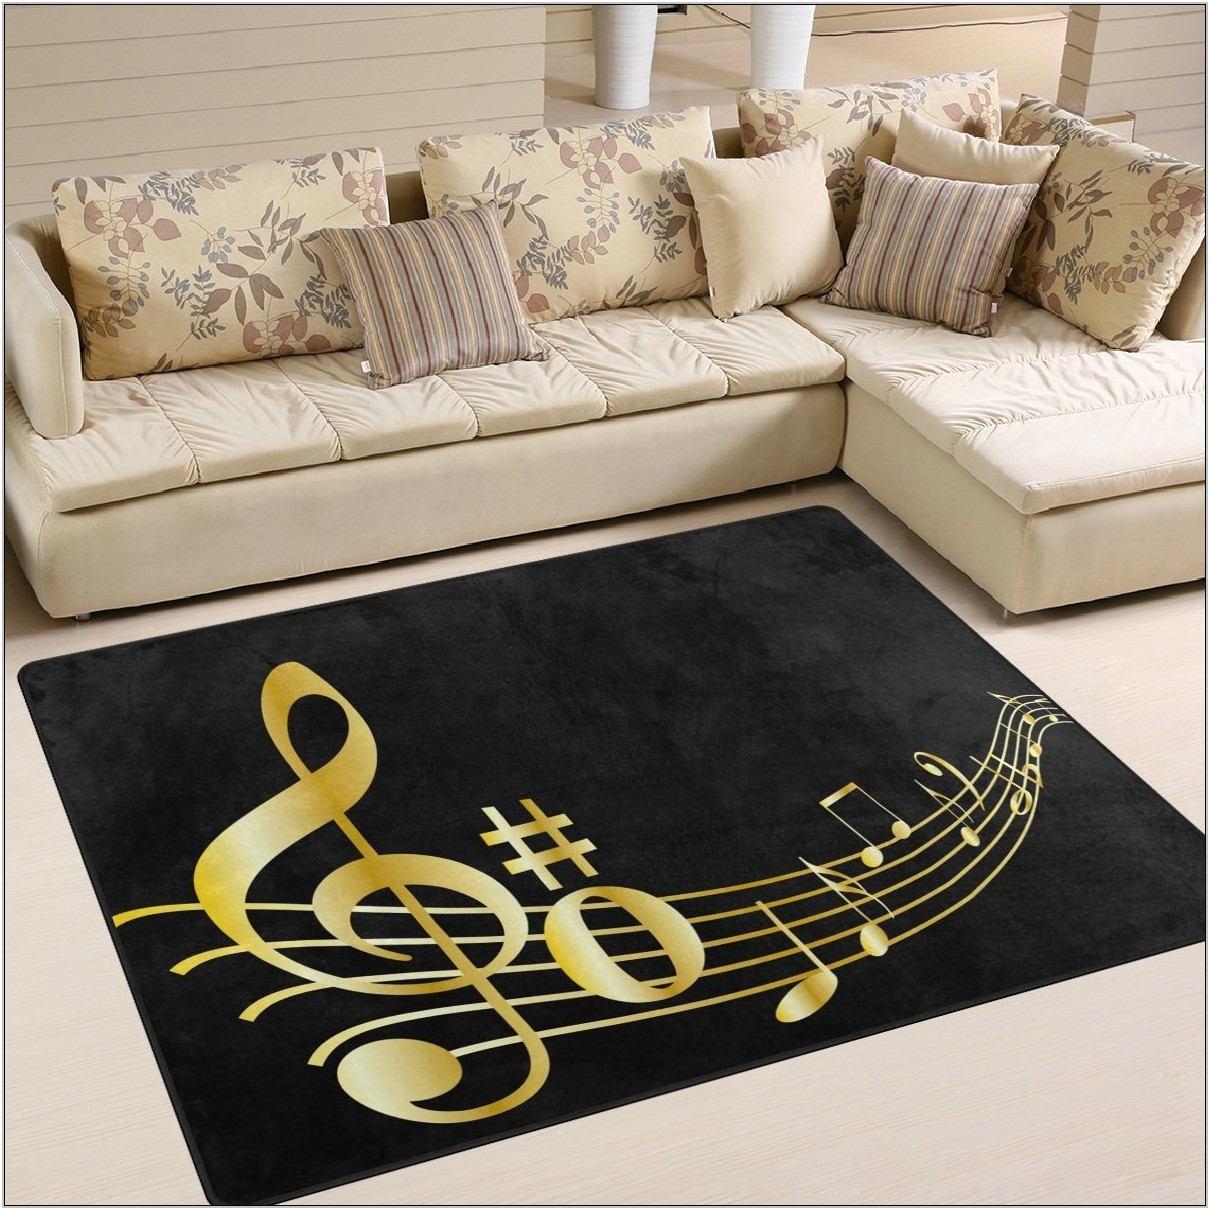 Gold Rug For Living Room